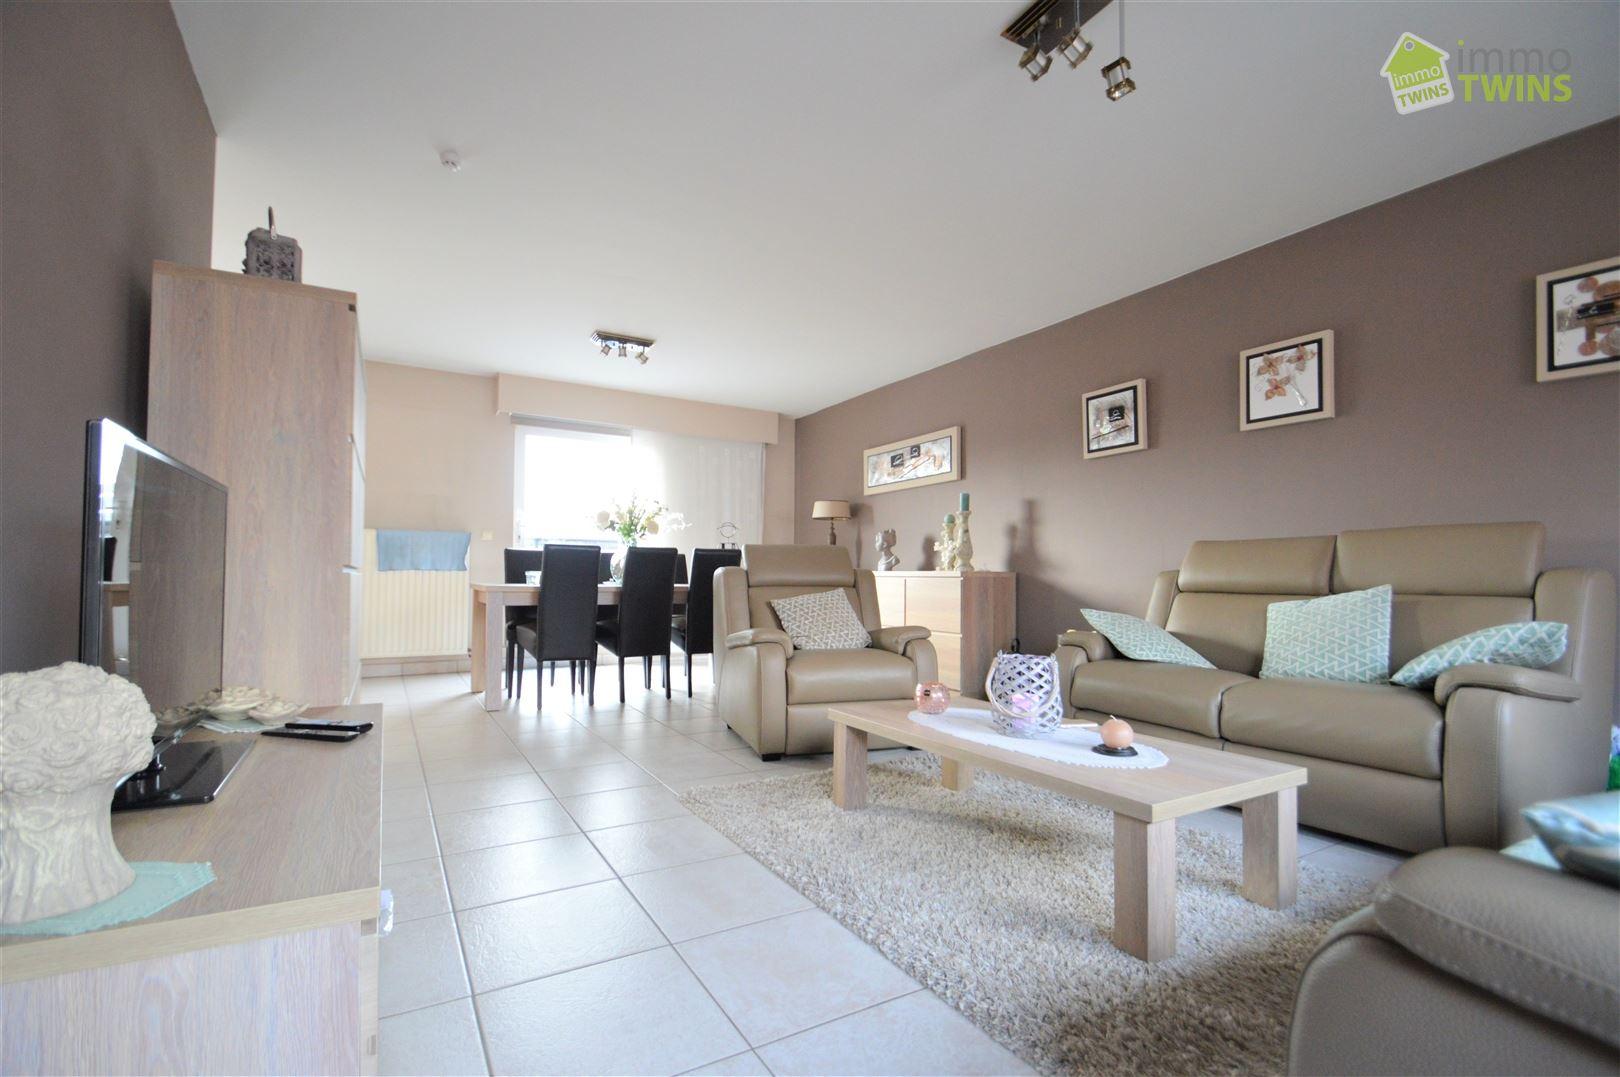 Foto 2 : Appartement te 9200 BAASRODE (België) - Prijs € 630